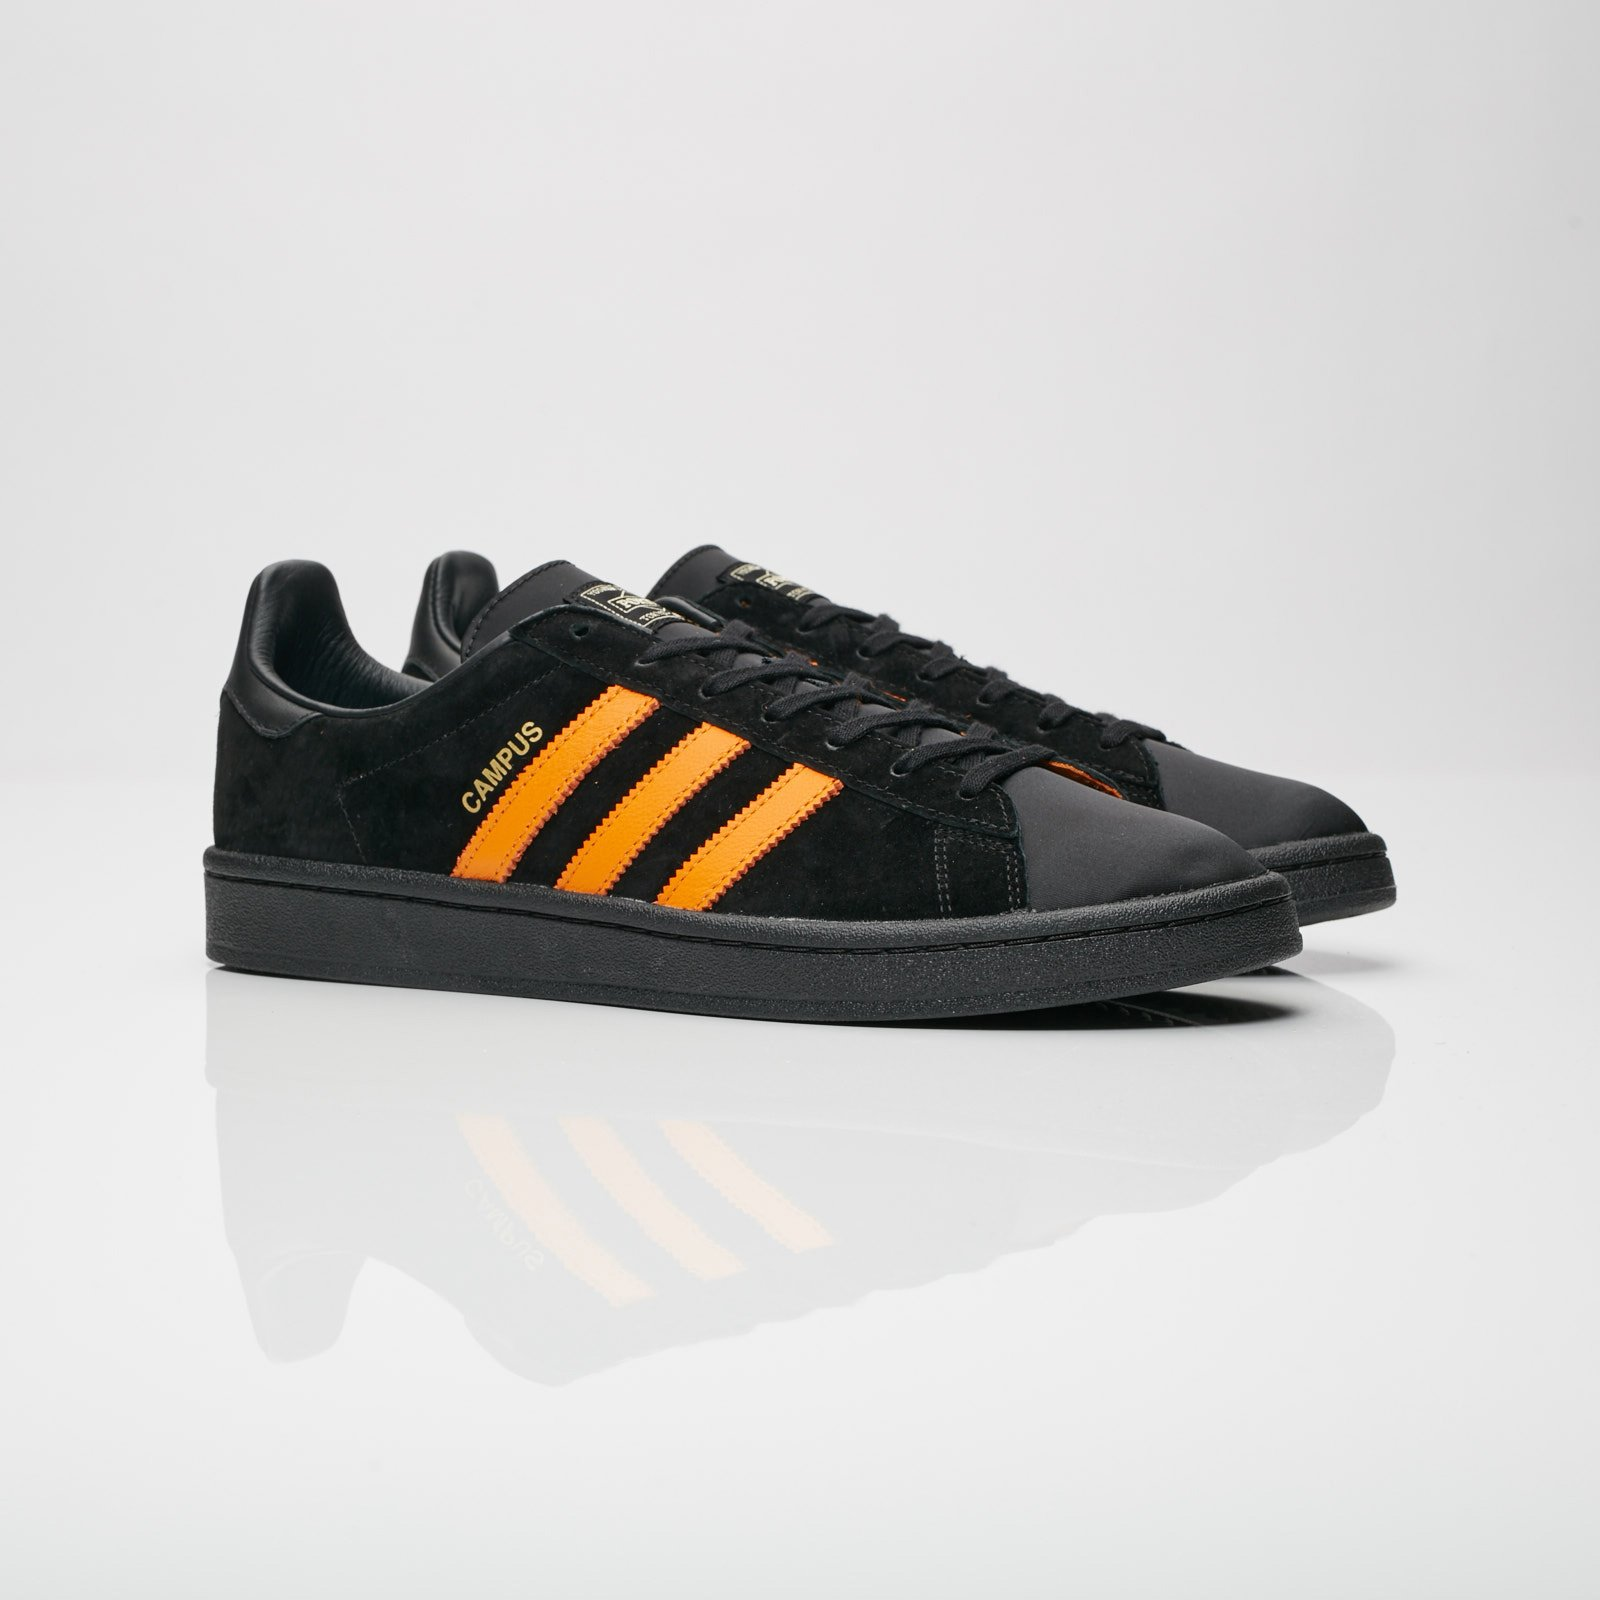 f8a80d5f159e adidas Campus x Porter - B28143 - Sneakersnstuff